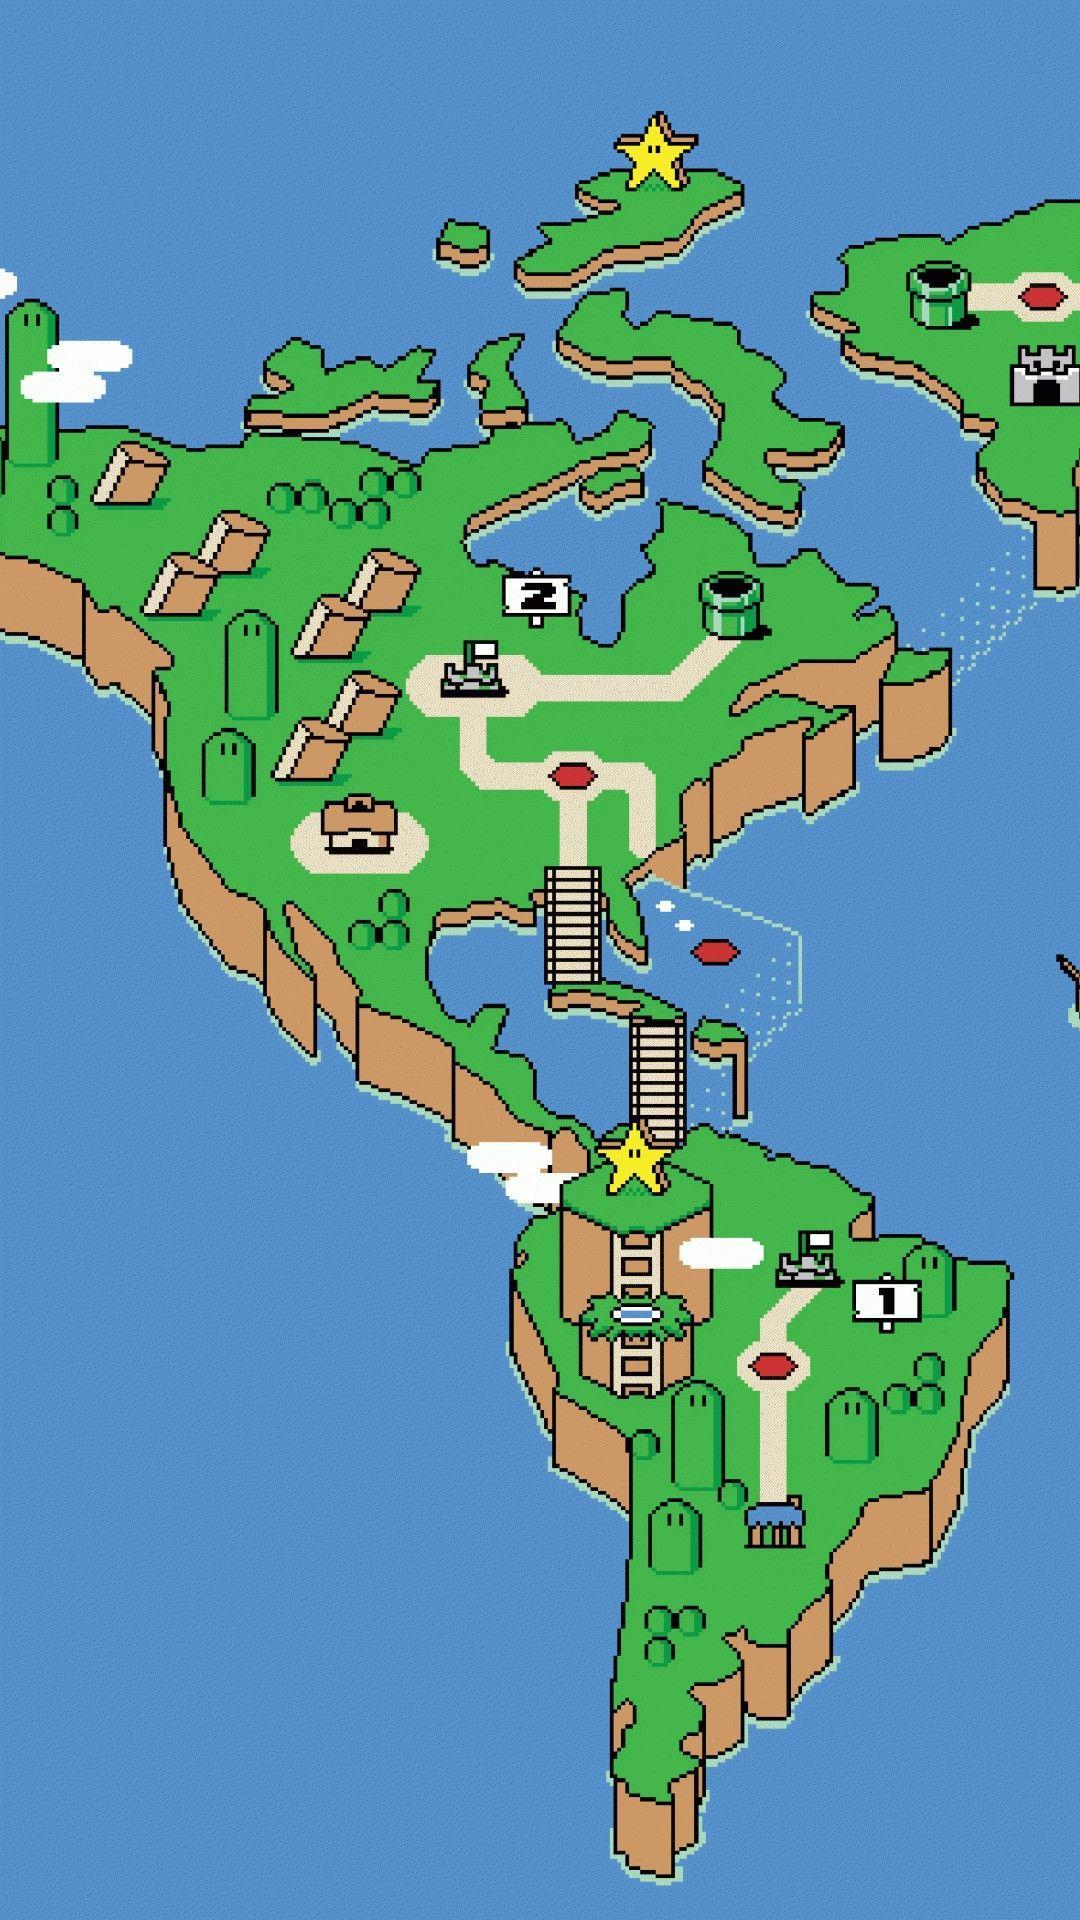 Super Mario World Map Wallpapers Wallpaper Cave